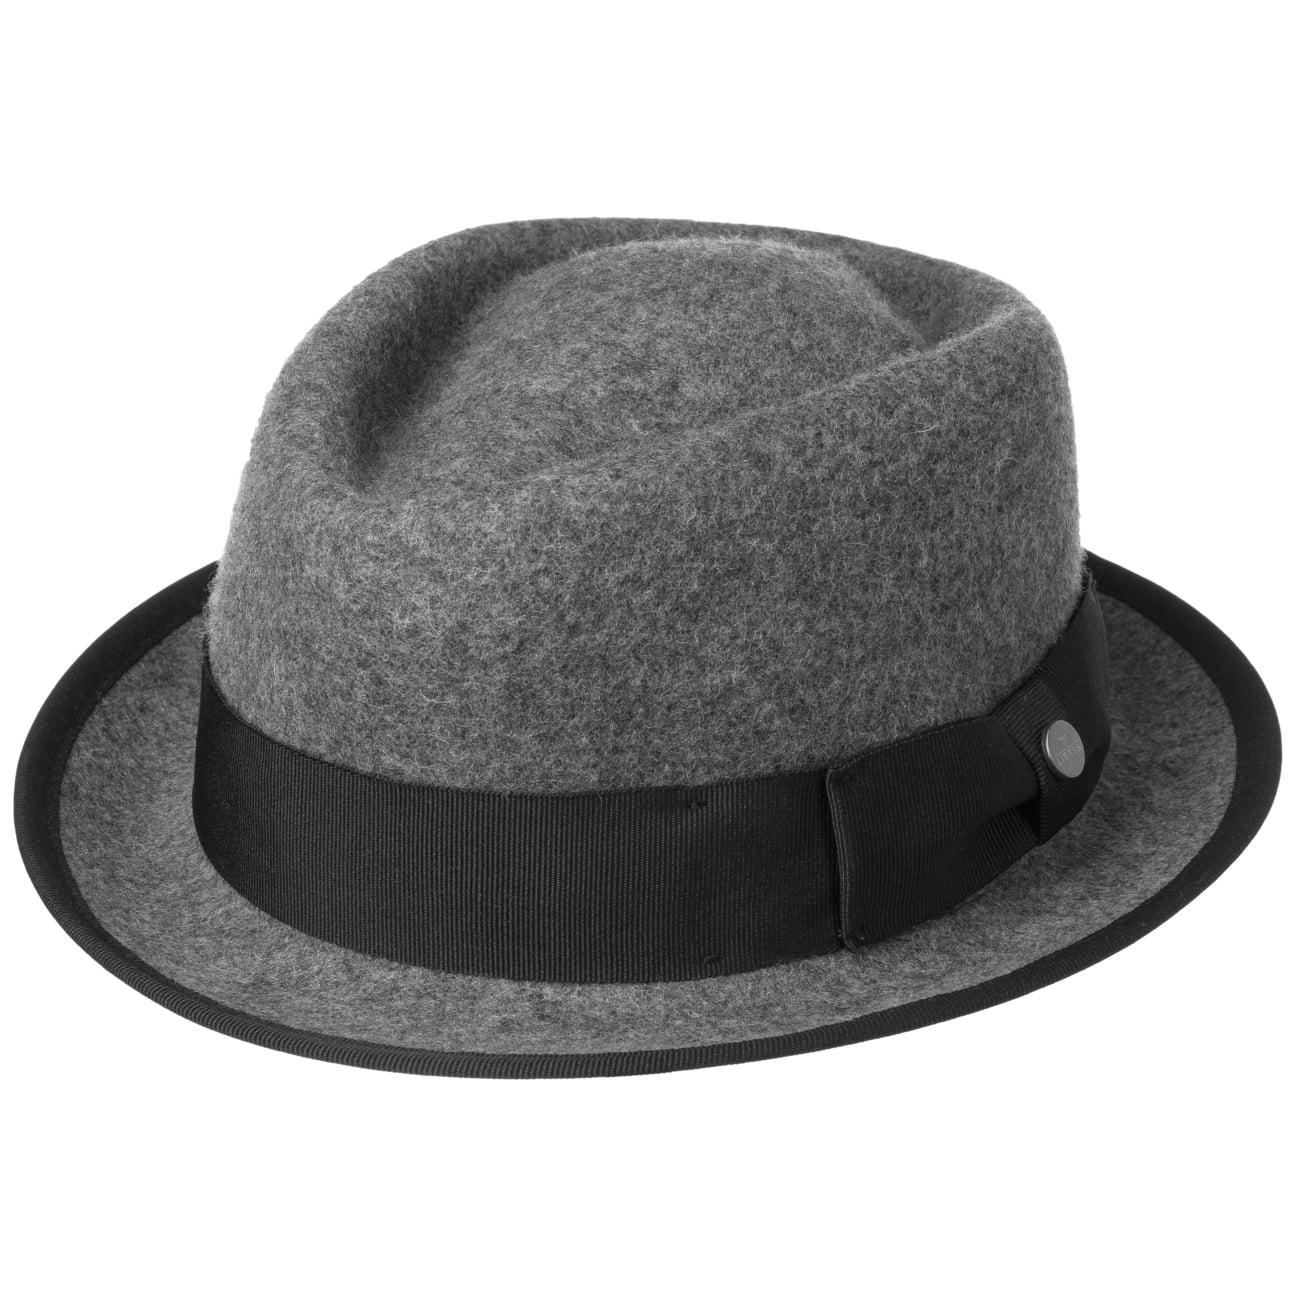 Sombrero Diamond Mix Porkpie by Lierys - Sombreros - sombreroshop.es 19f770398b4